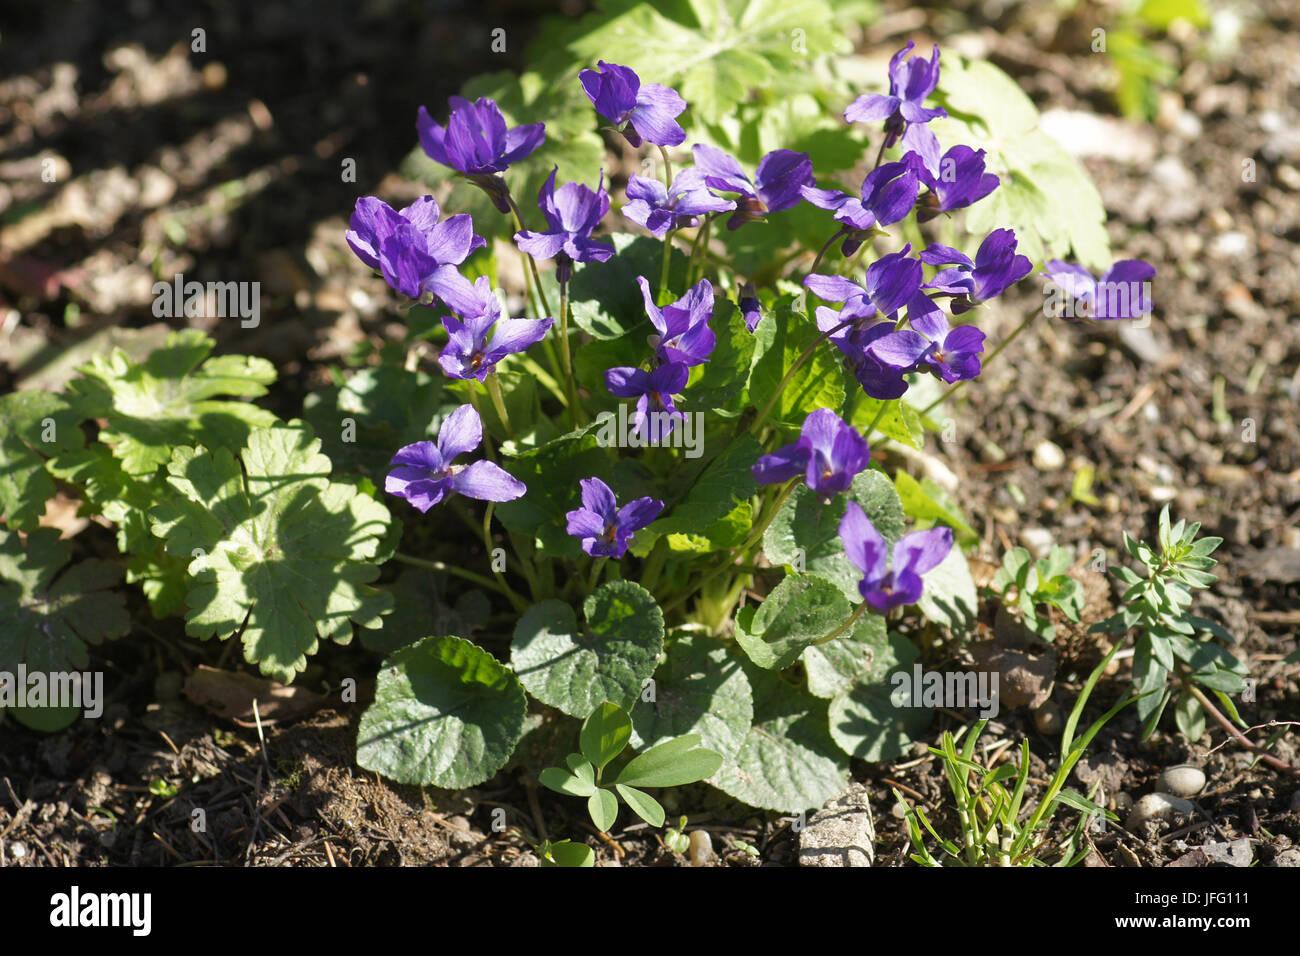 Viola odorata, Sweet Violet - Stock Image